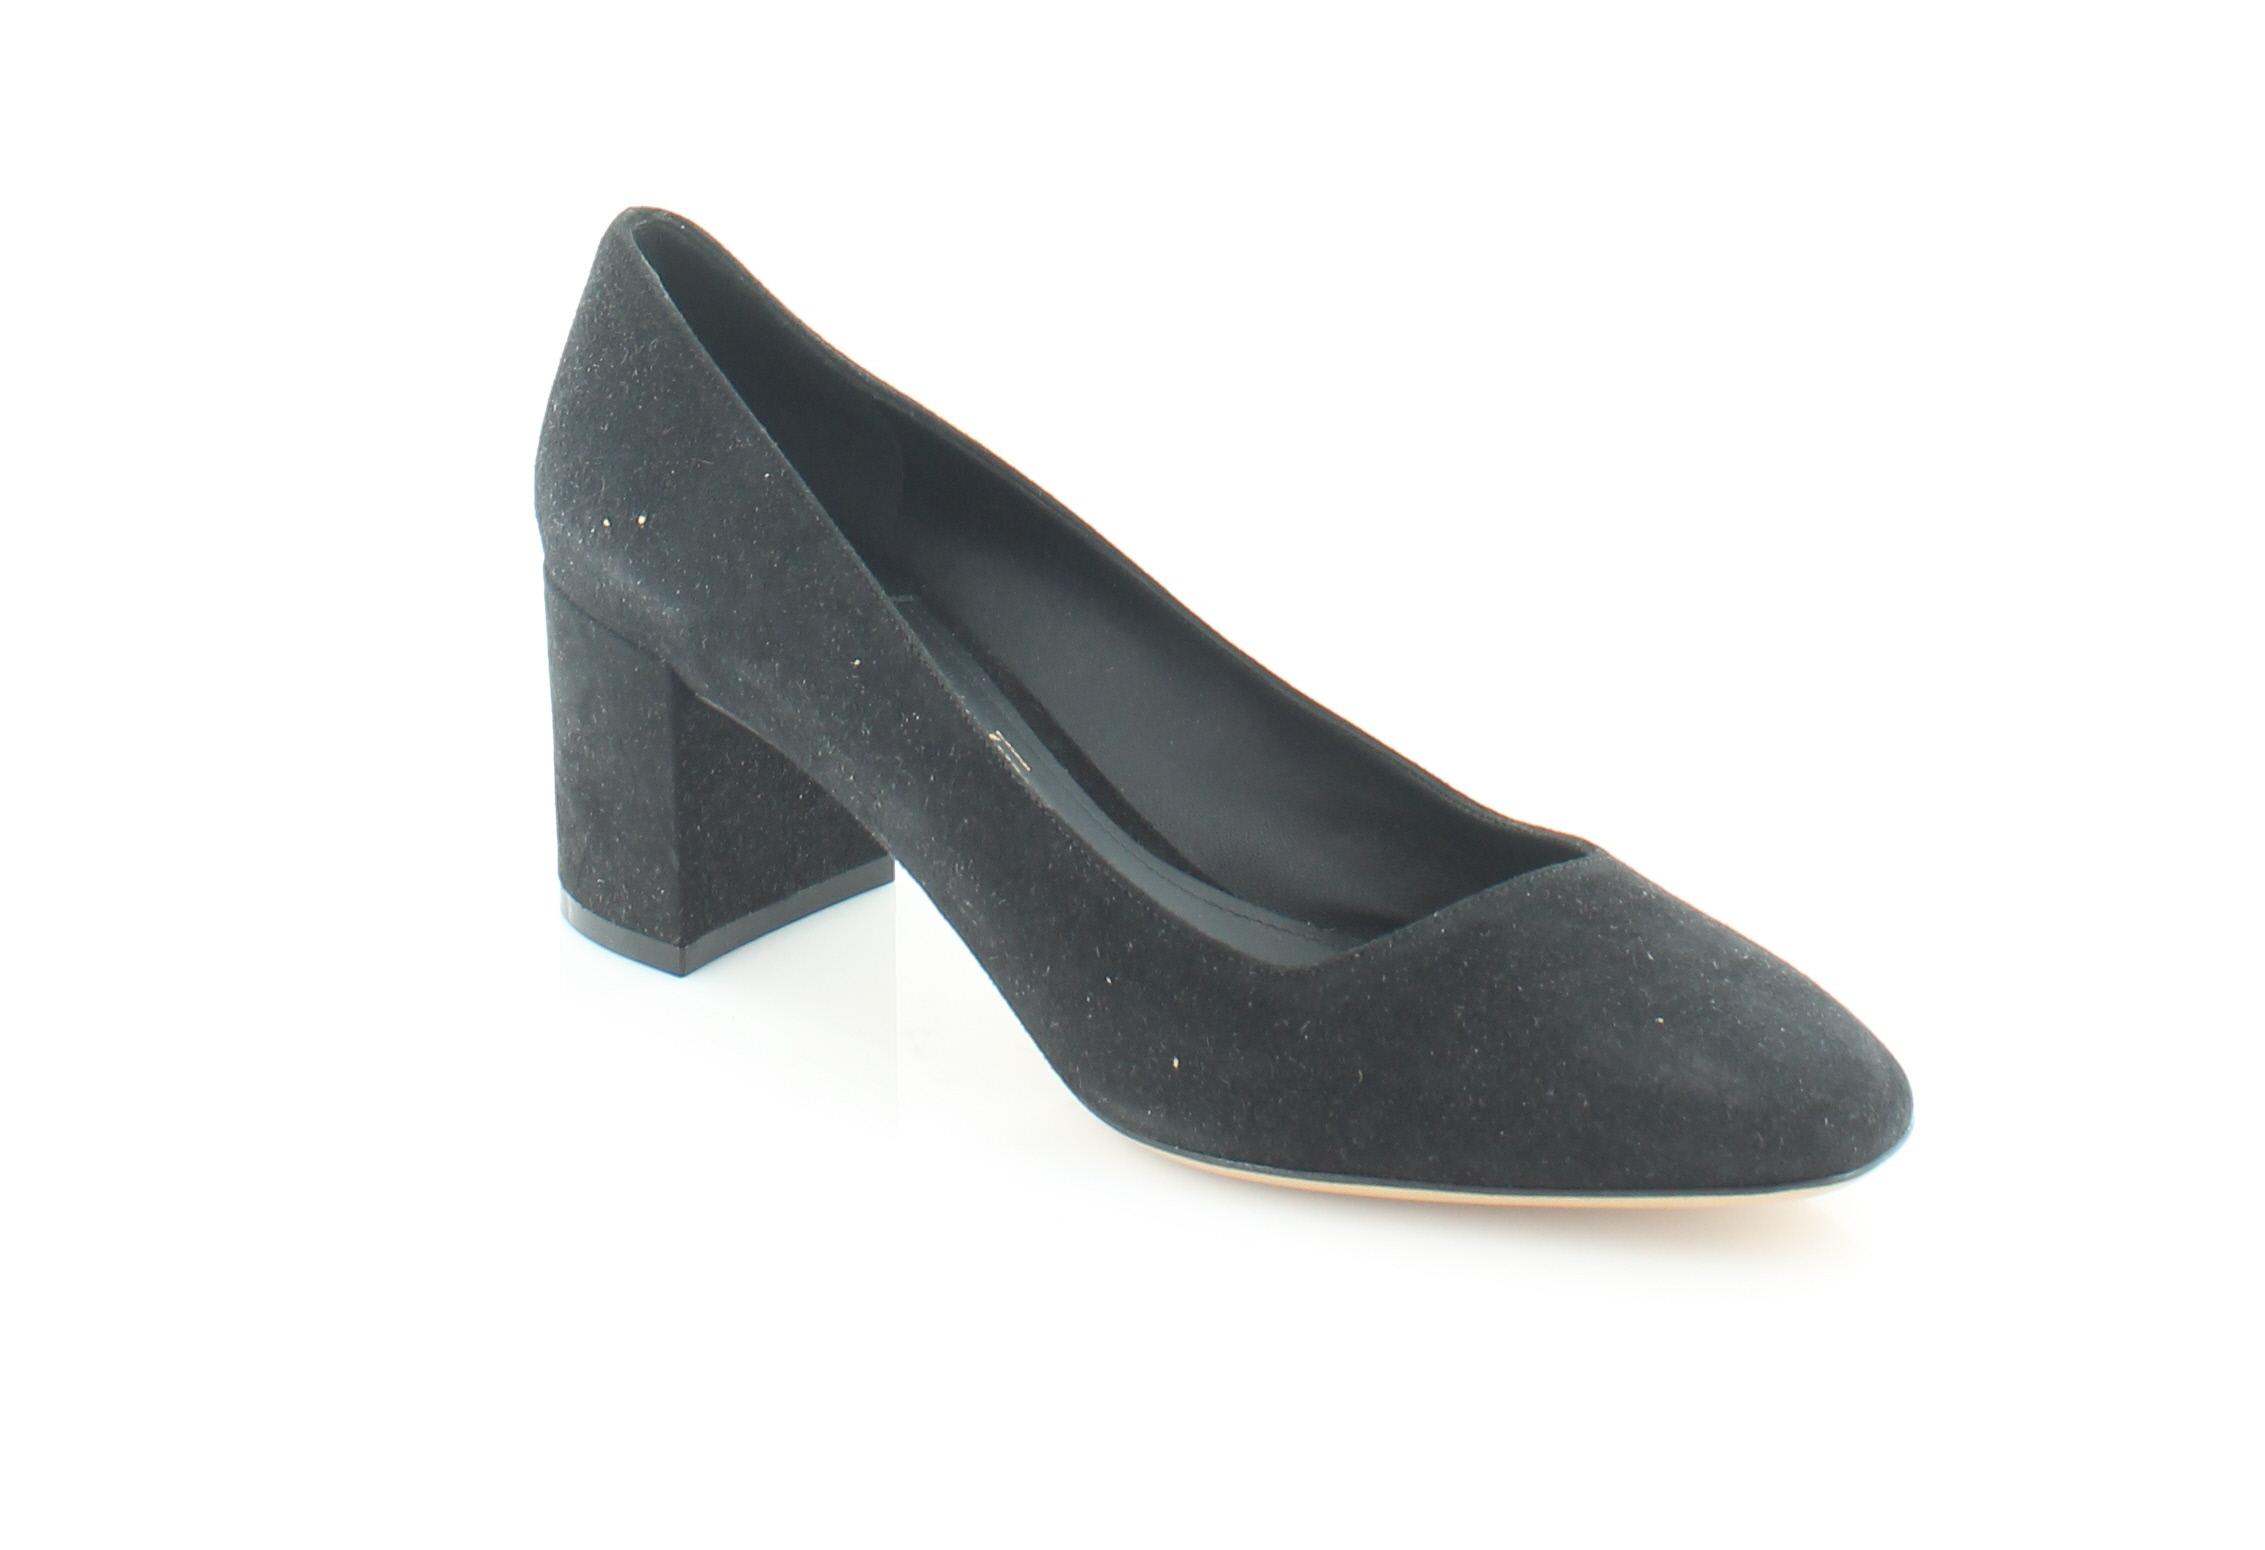 99ab7a2bafdf Salvatore Ferragamo Arezzo Black Womens Shoes Size 6.5 M Heels MSRP  595